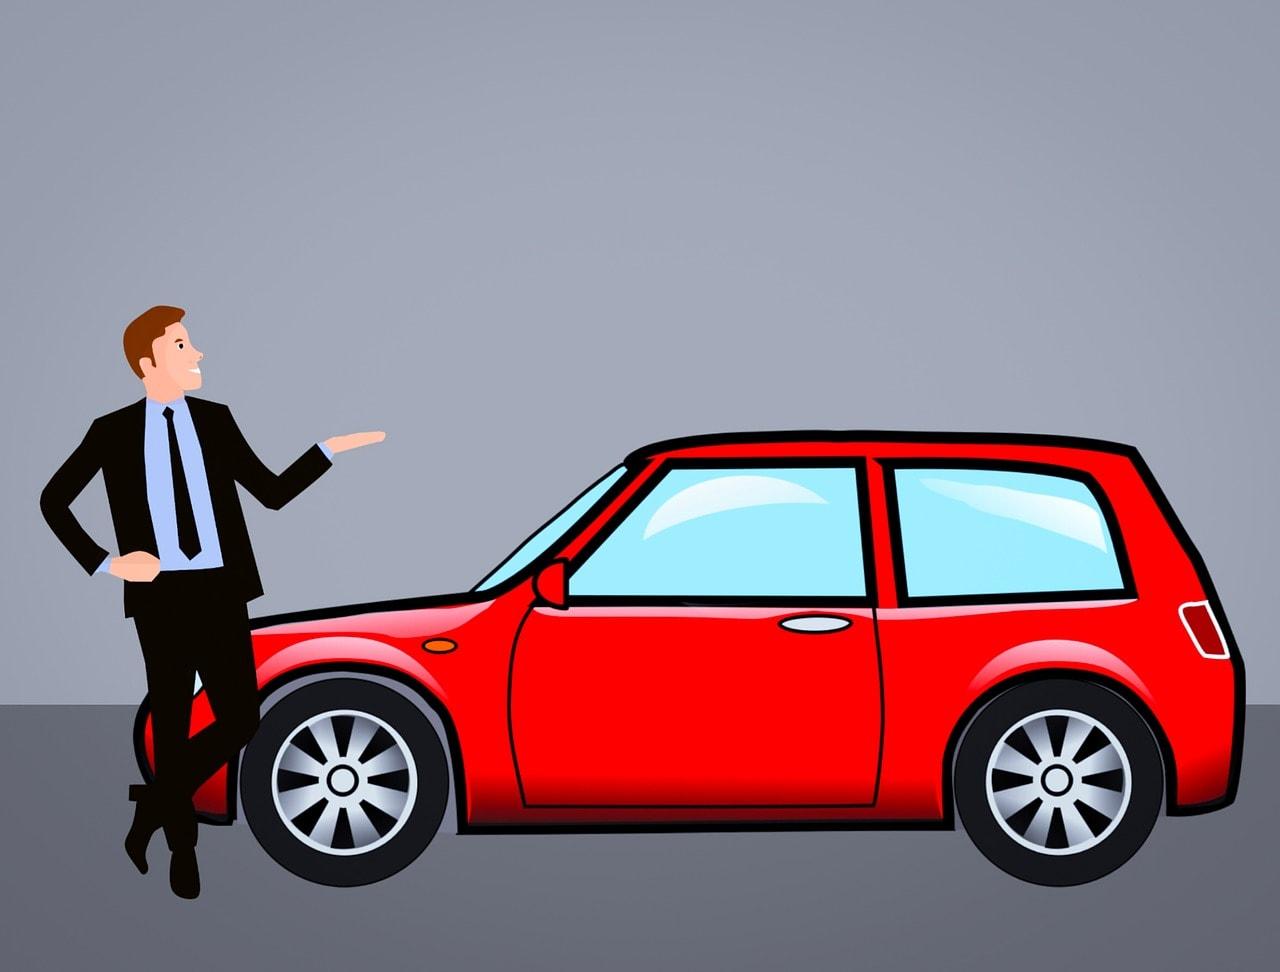 Choosing Your Next Vehicle